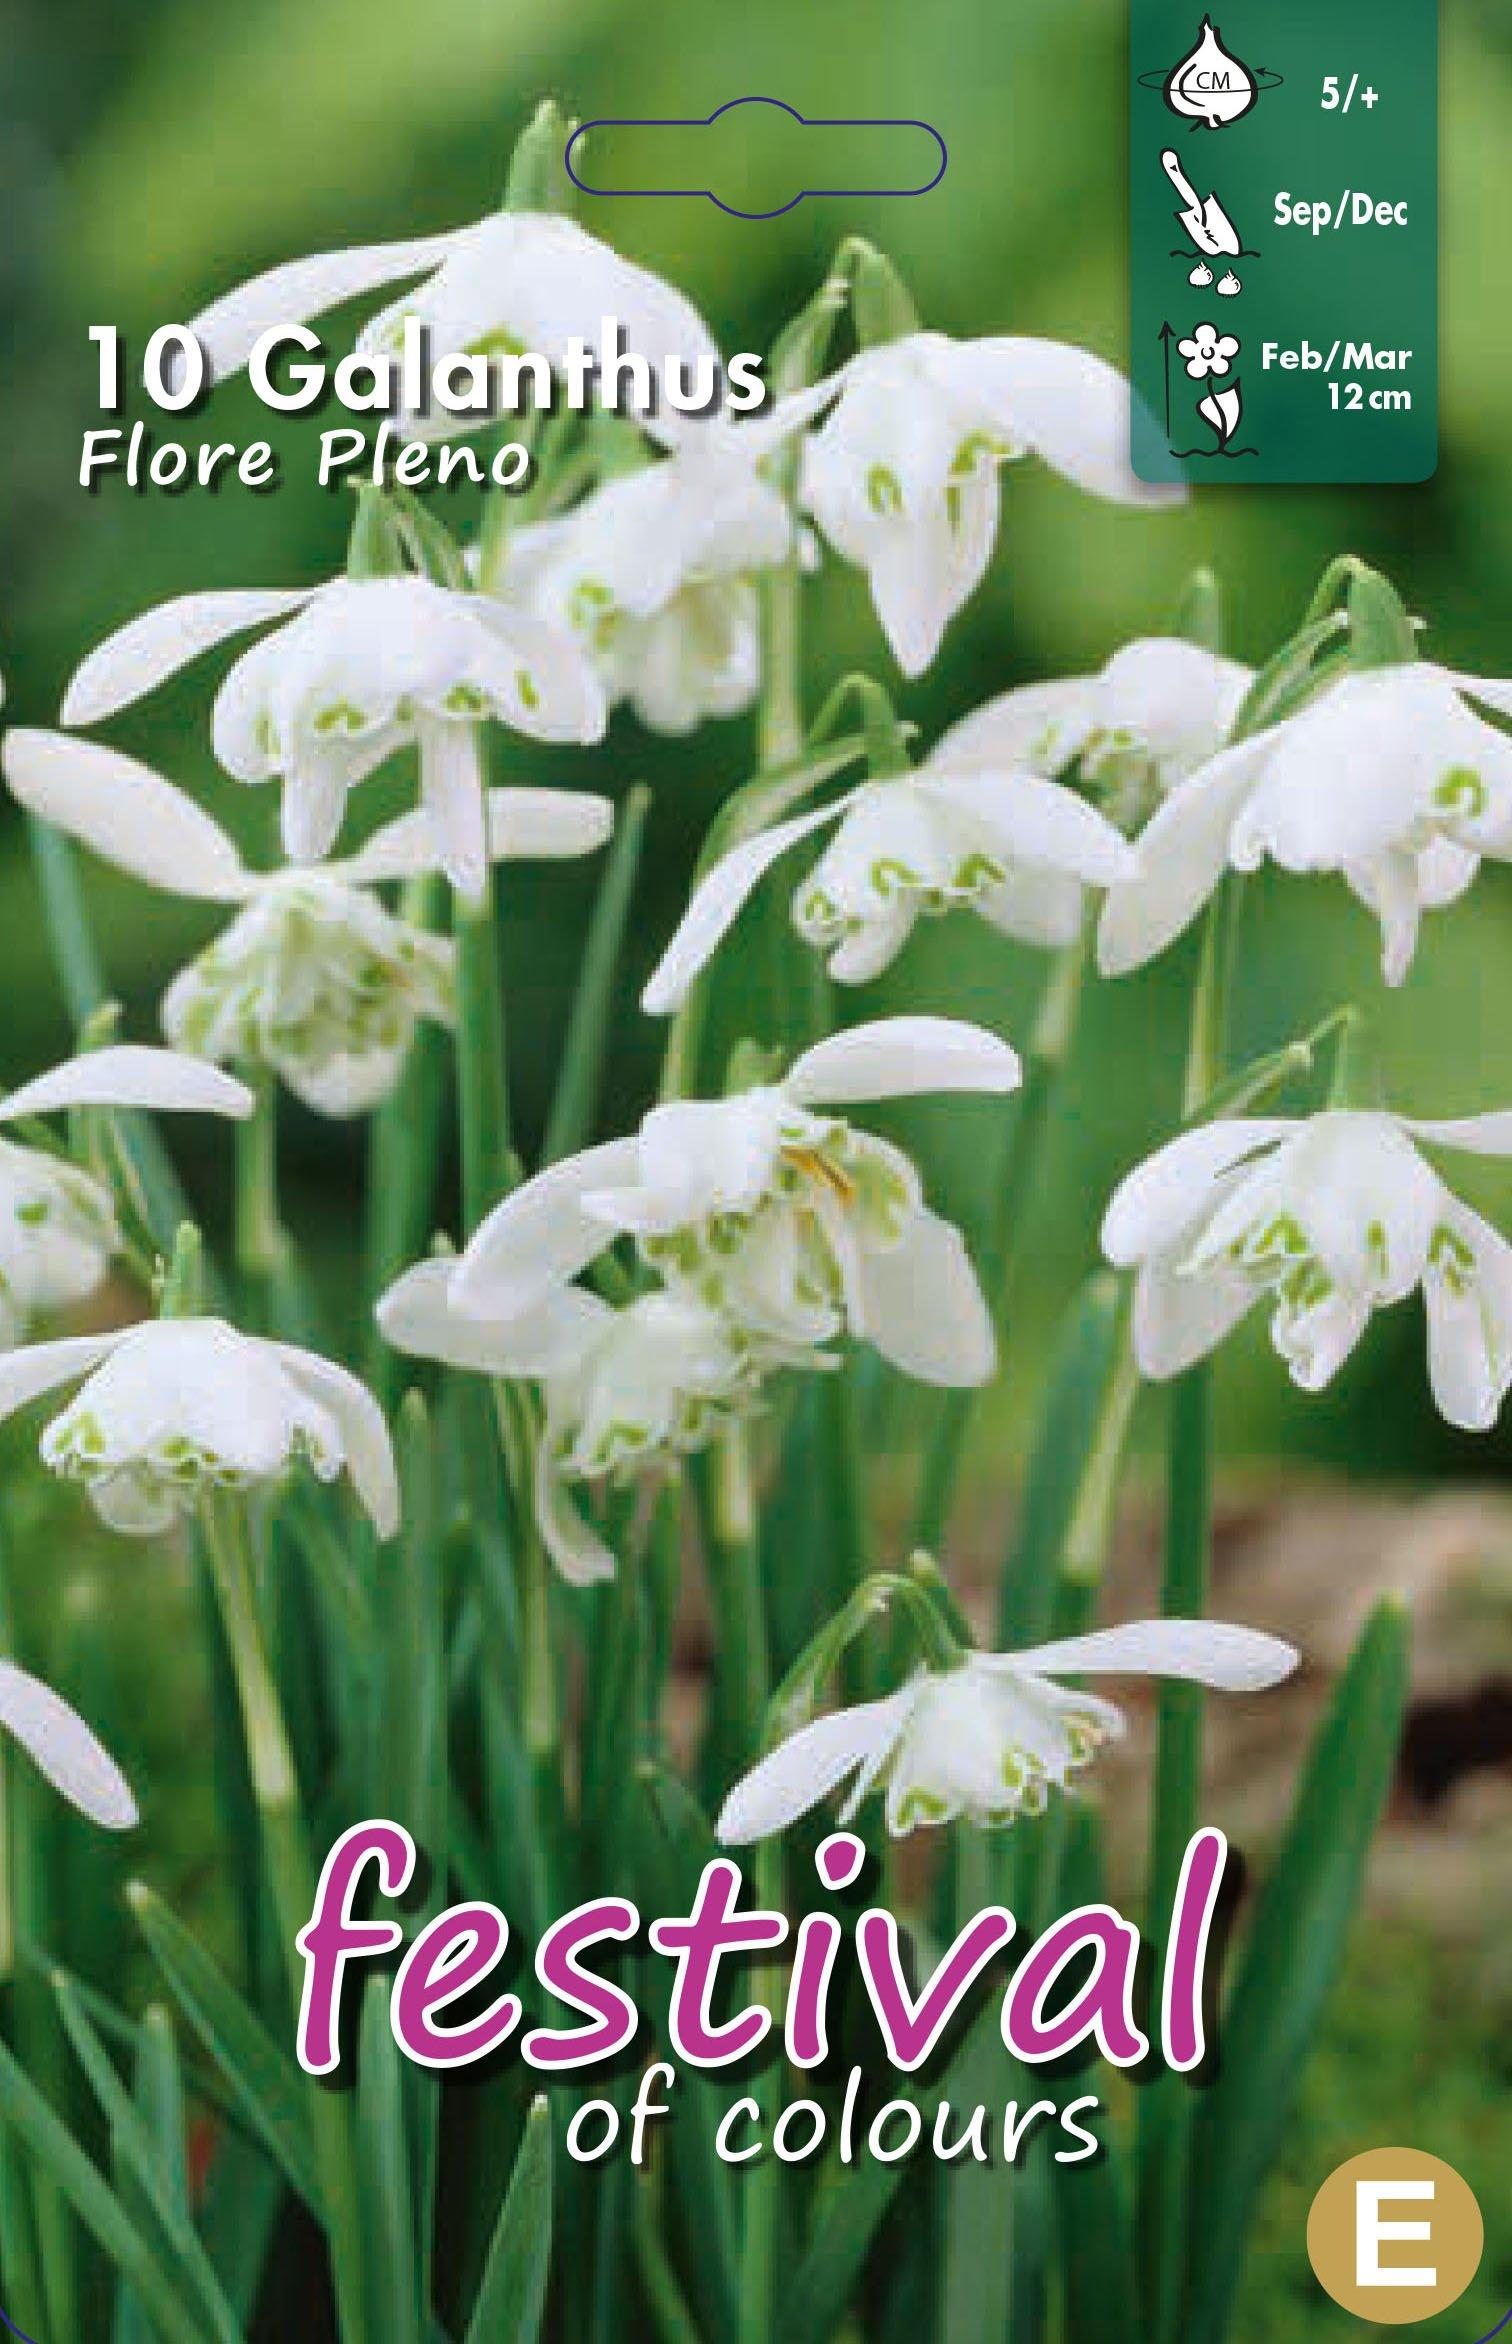 Galanthus Flore Pleno 10 stk